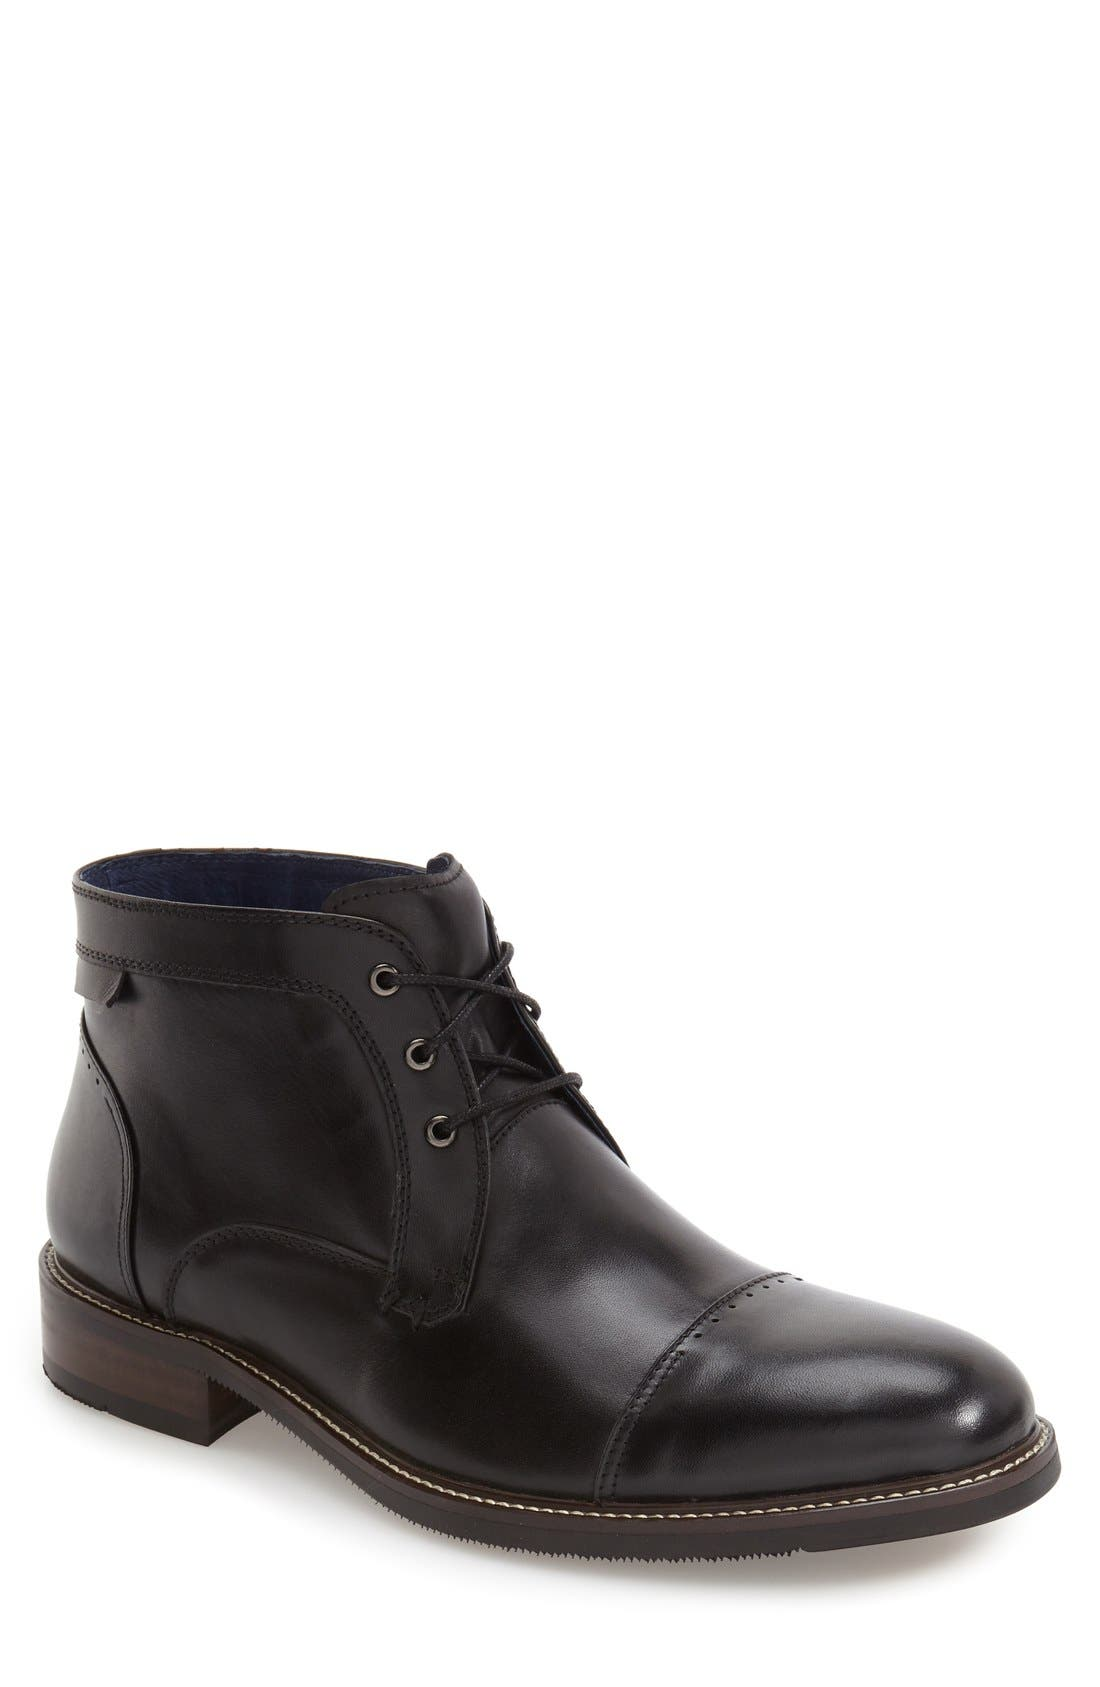 'Rubano' Chukka Boot,                         Main,                         color,